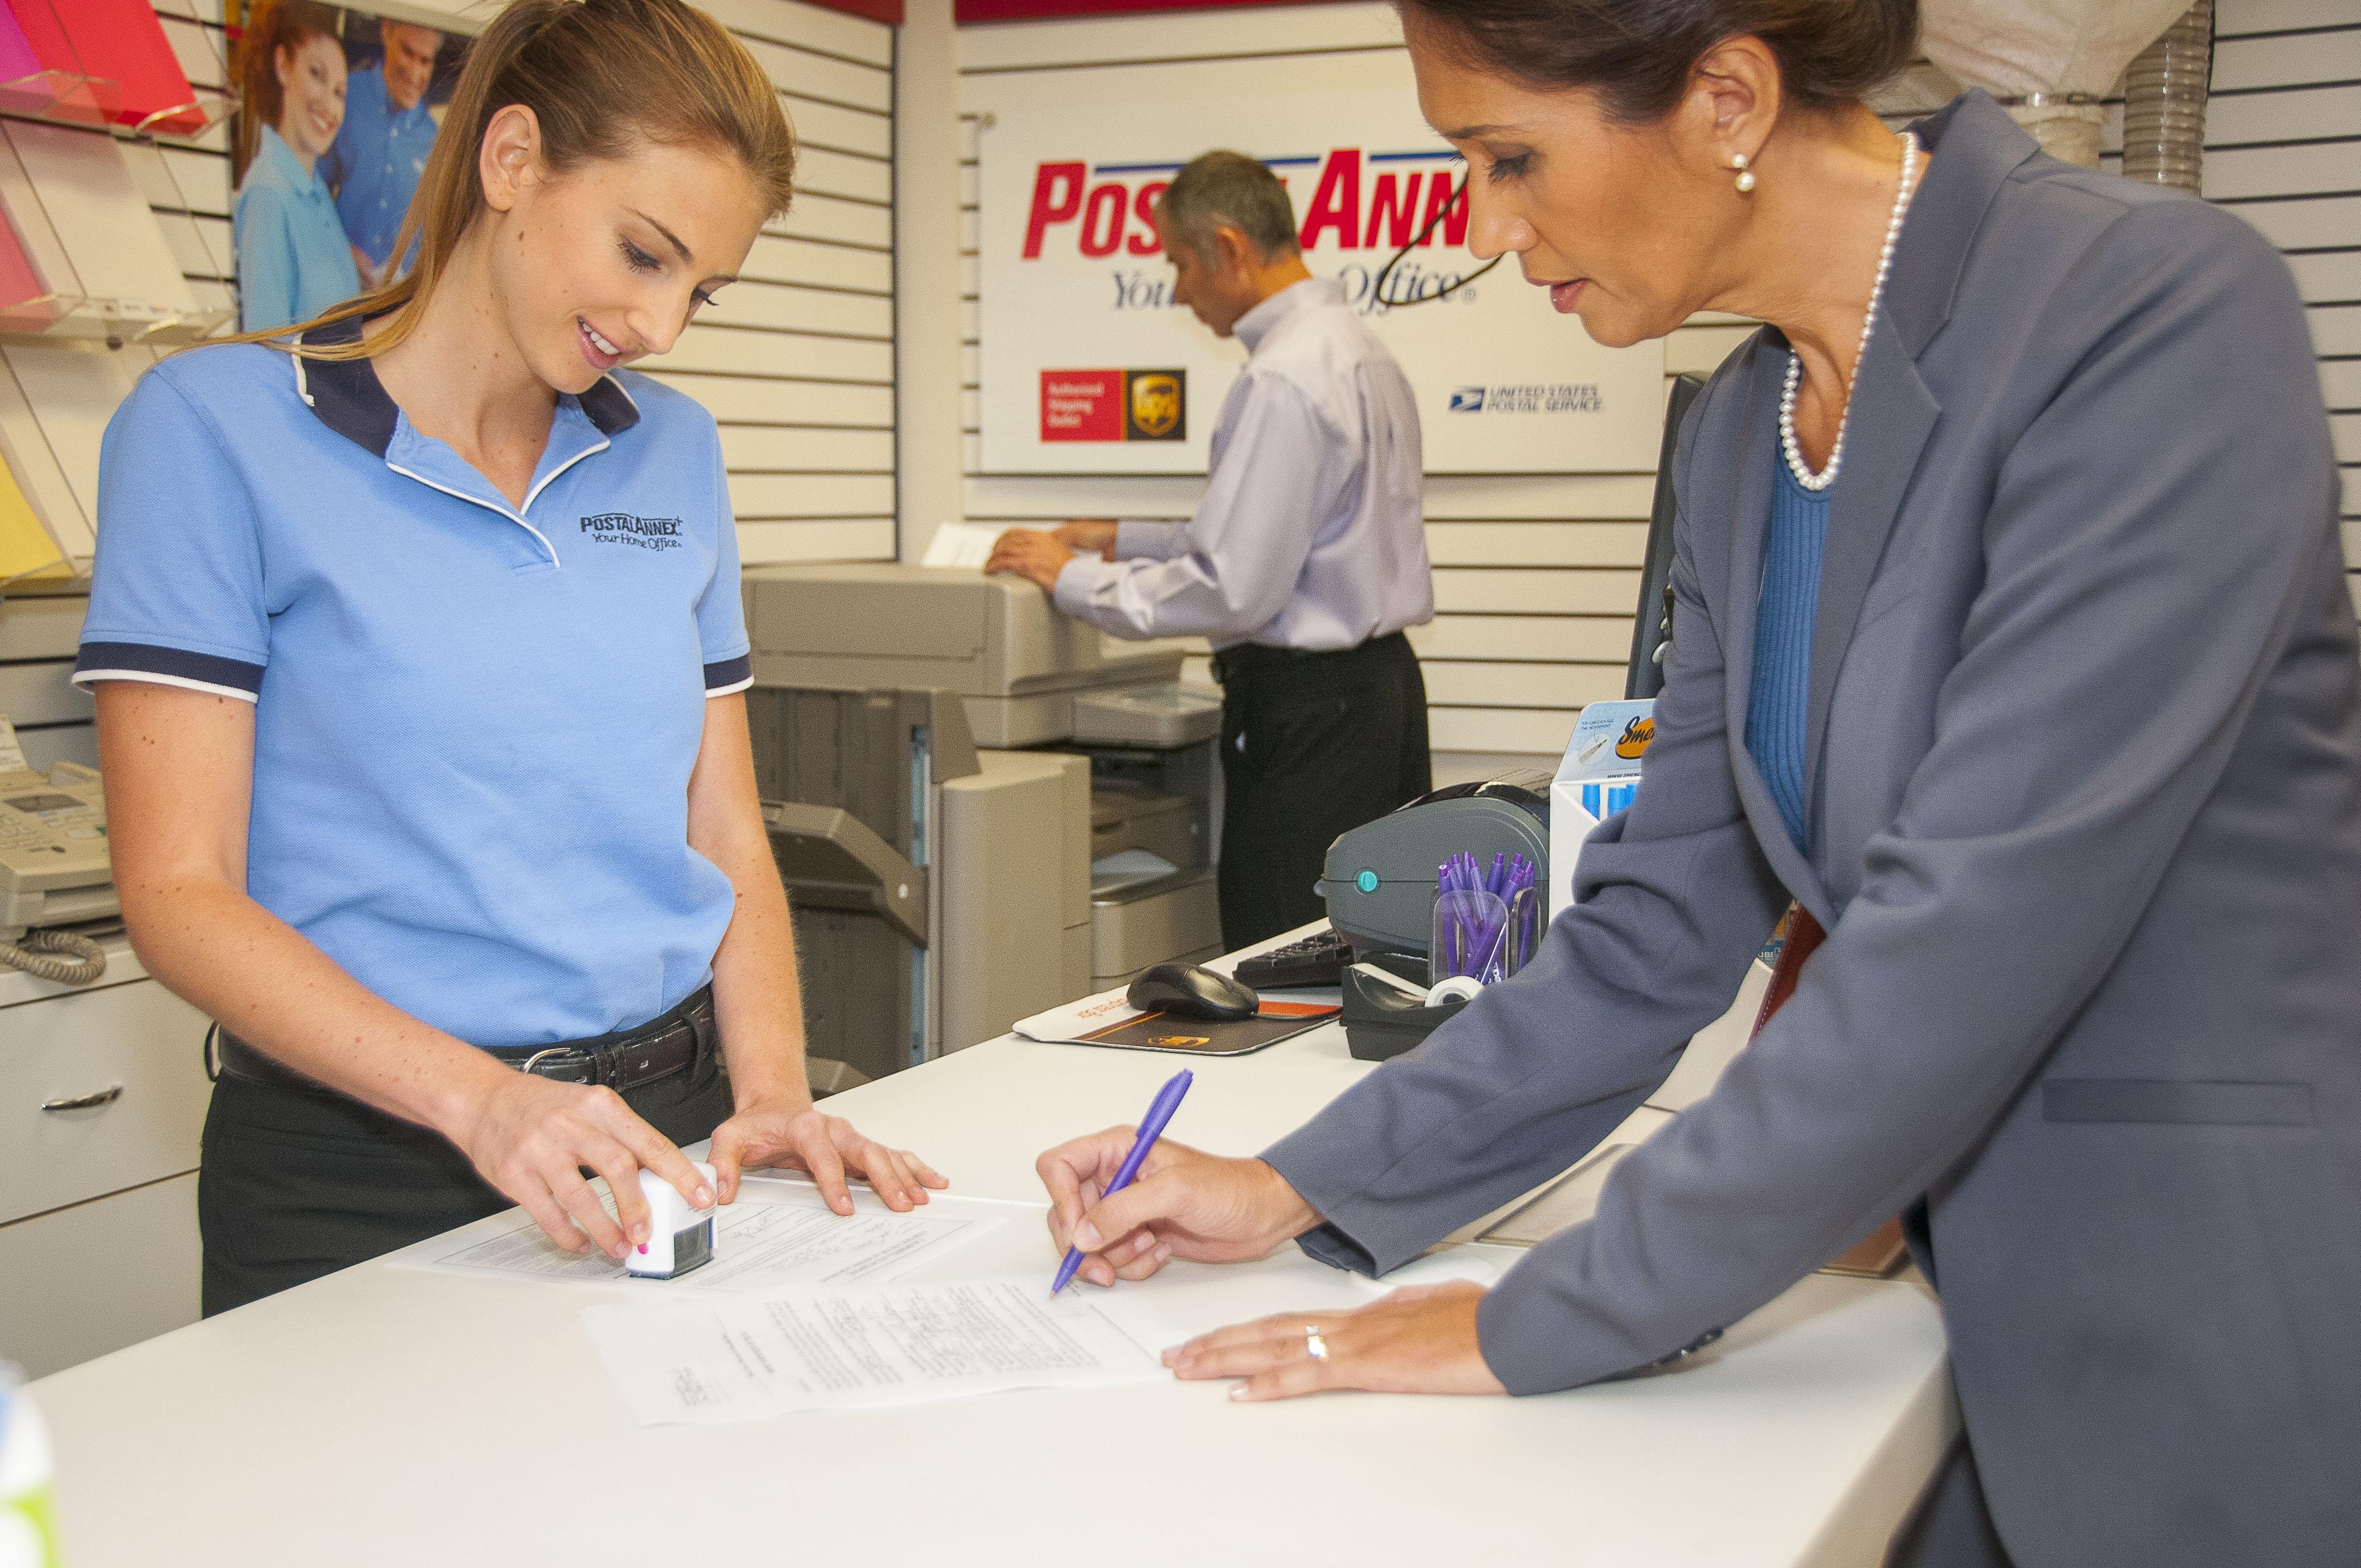 Postal Annex Franchising